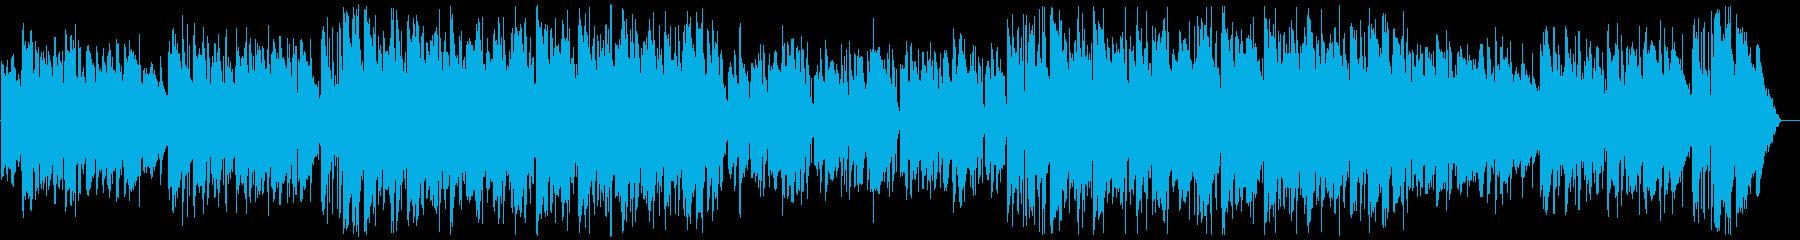 Youtube・雨の日の優しいペット映像の再生済みの波形